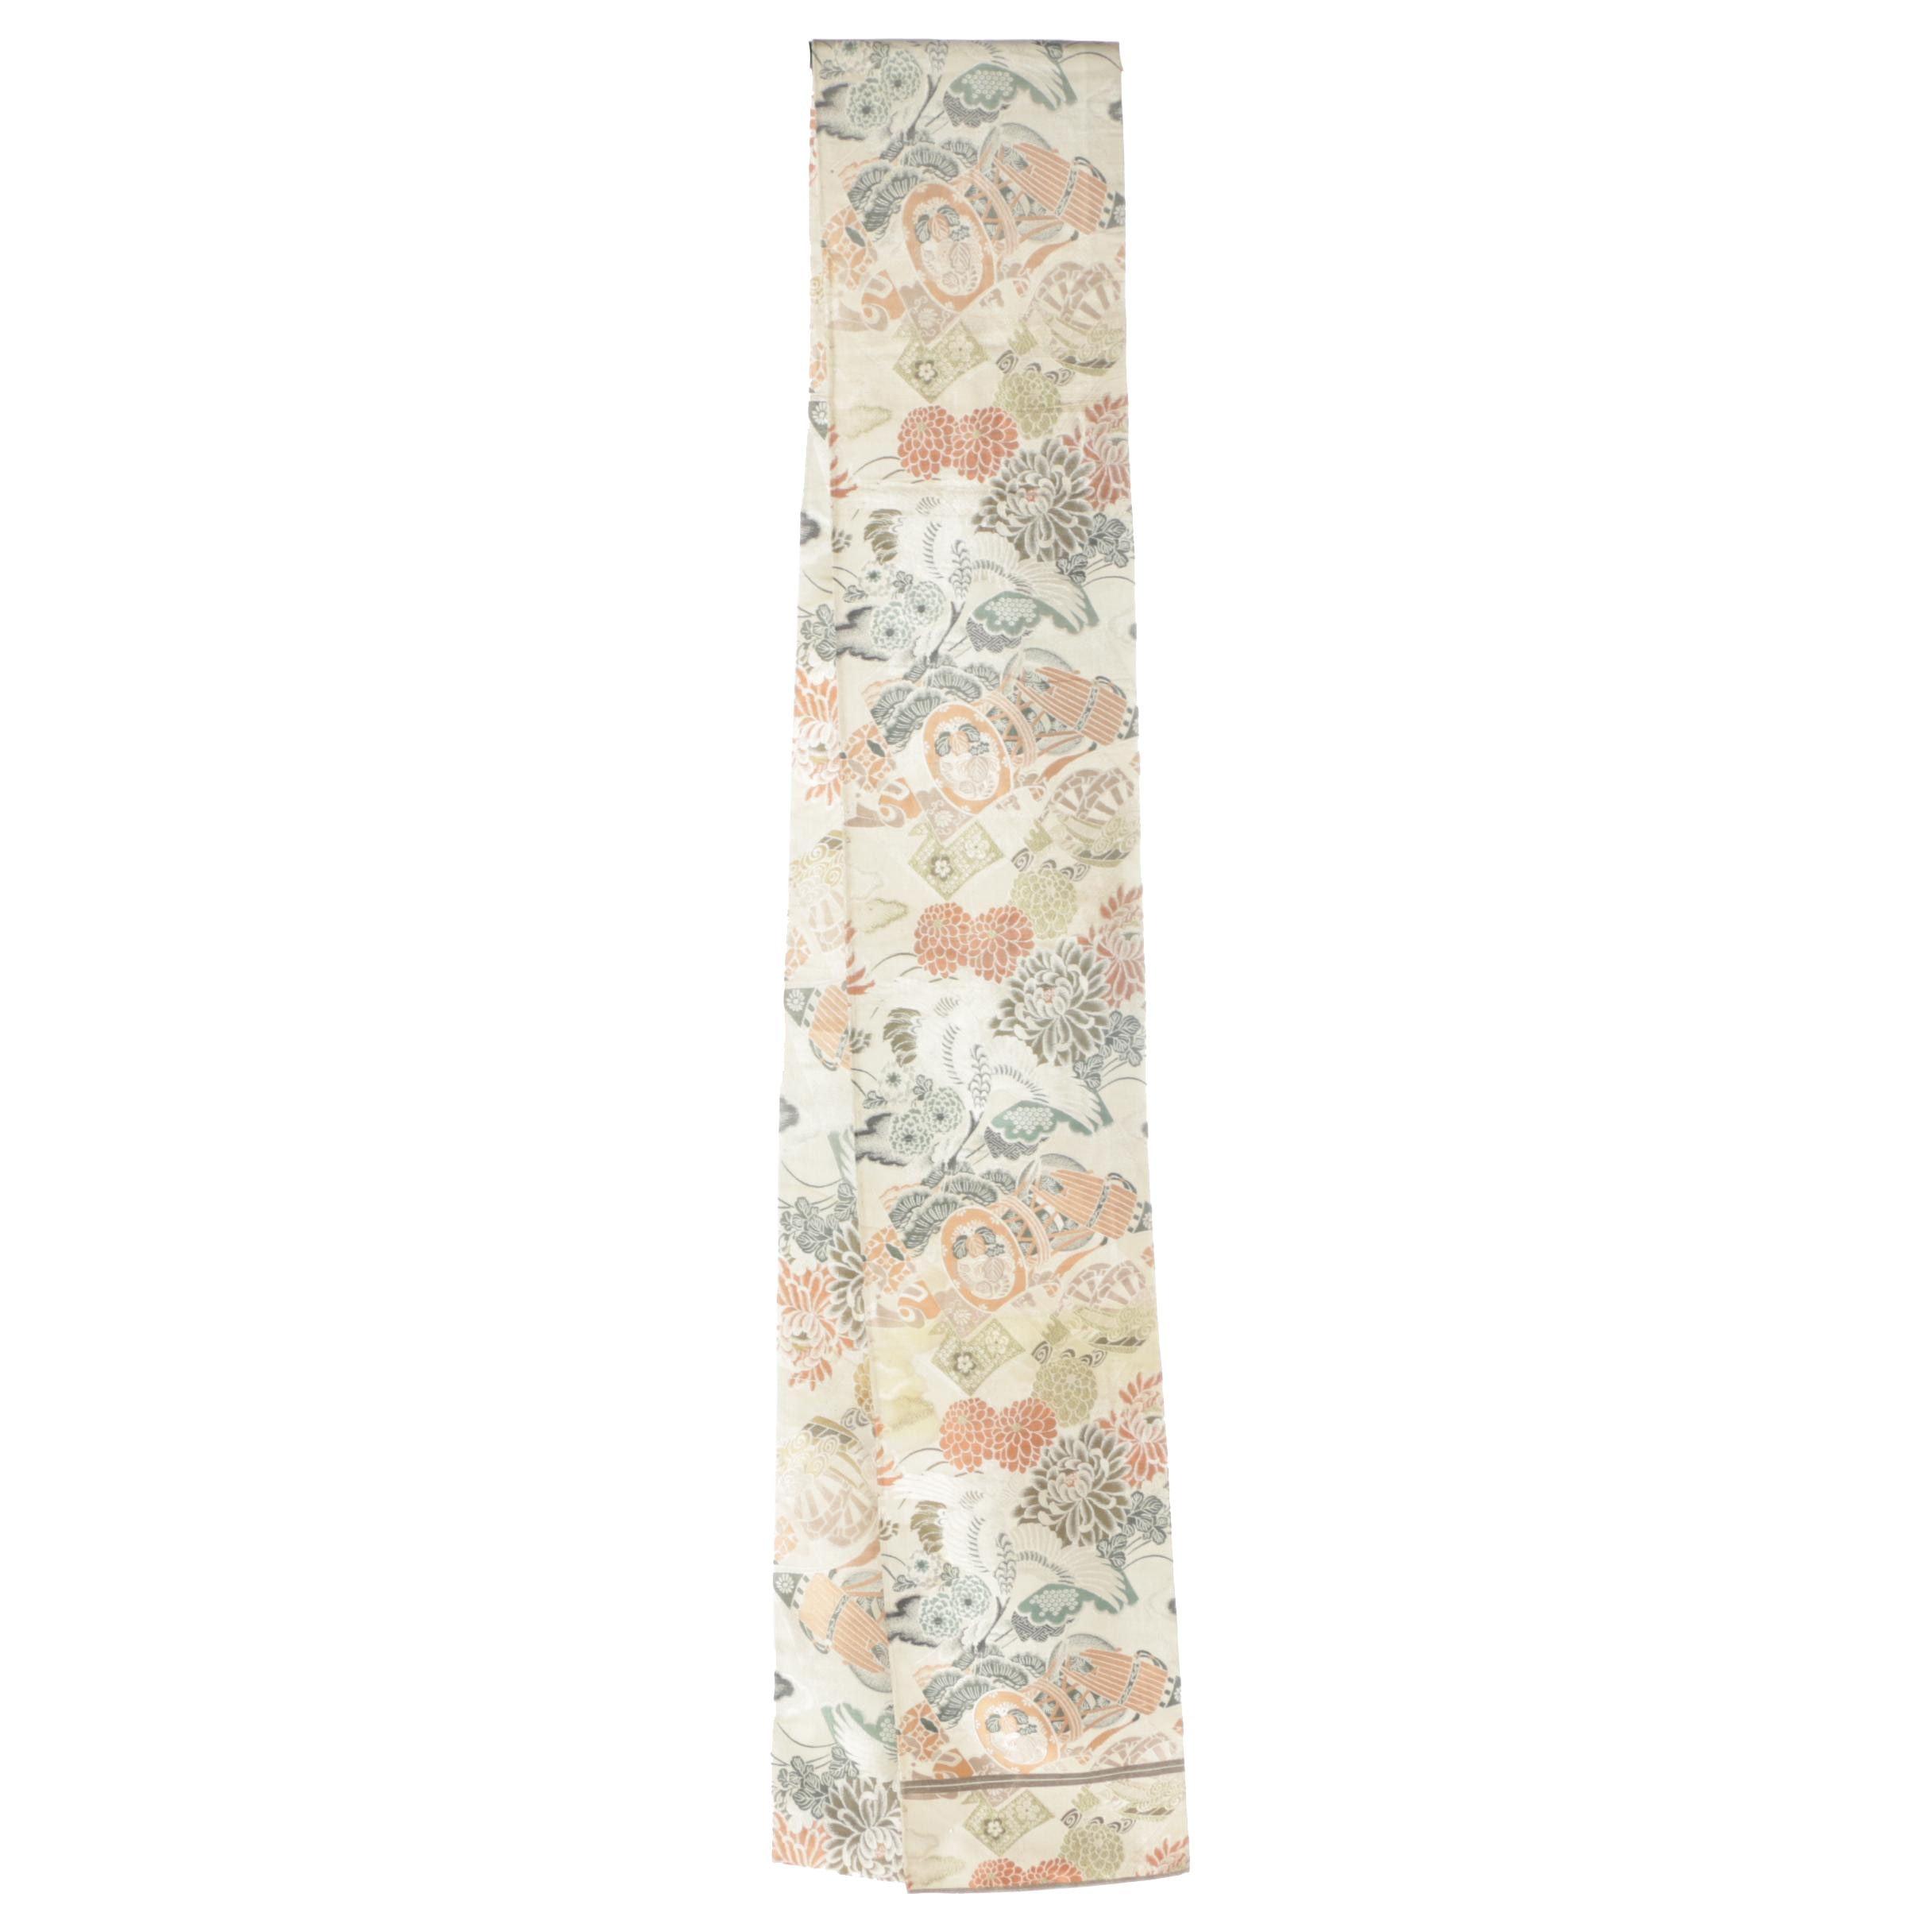 Circa 1900 Antique Japanese Silk Brocade Maru Obi